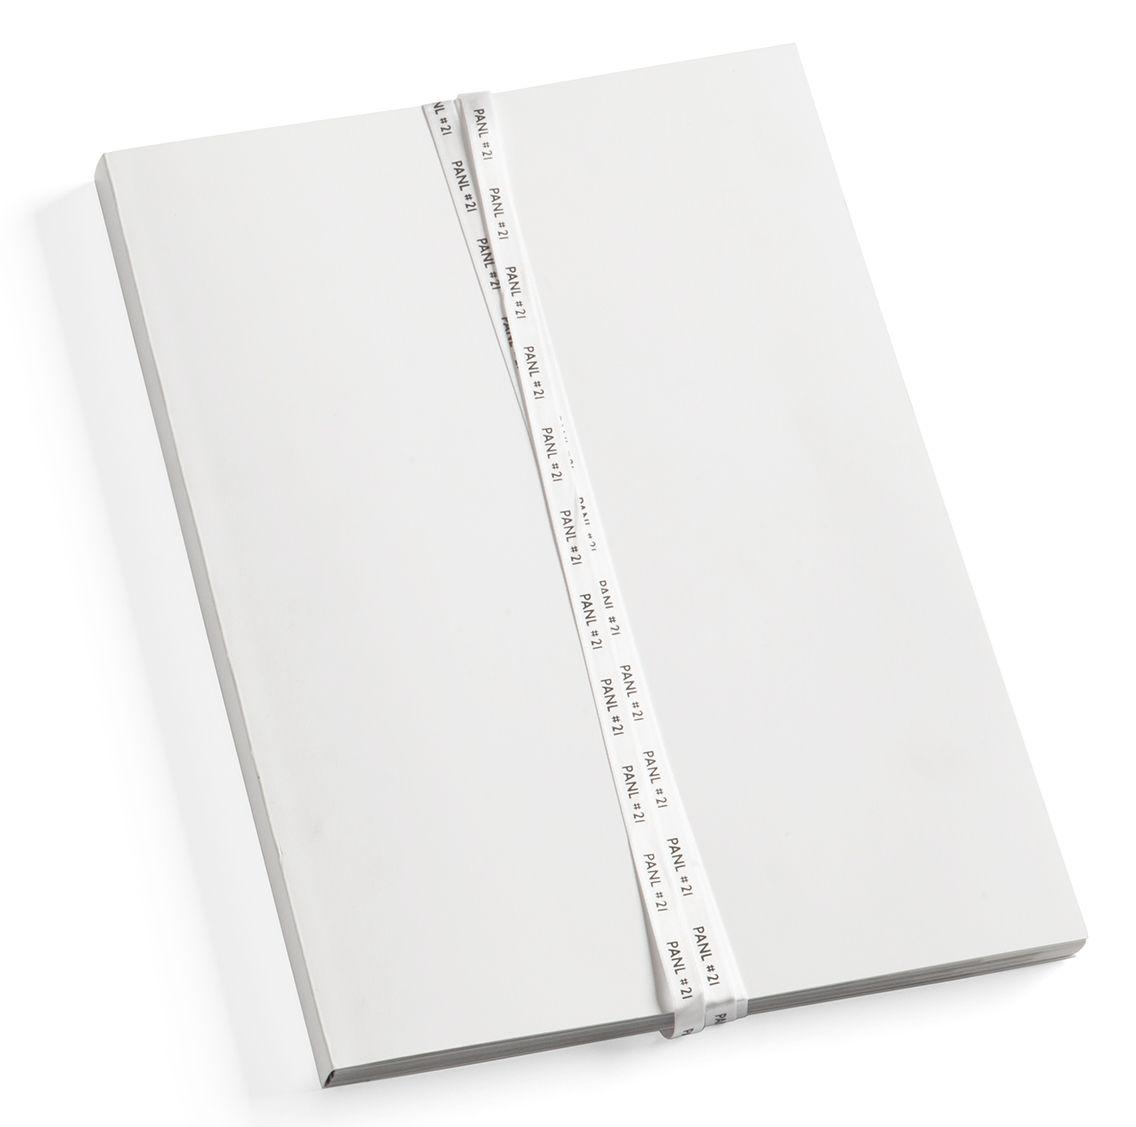 website & award book